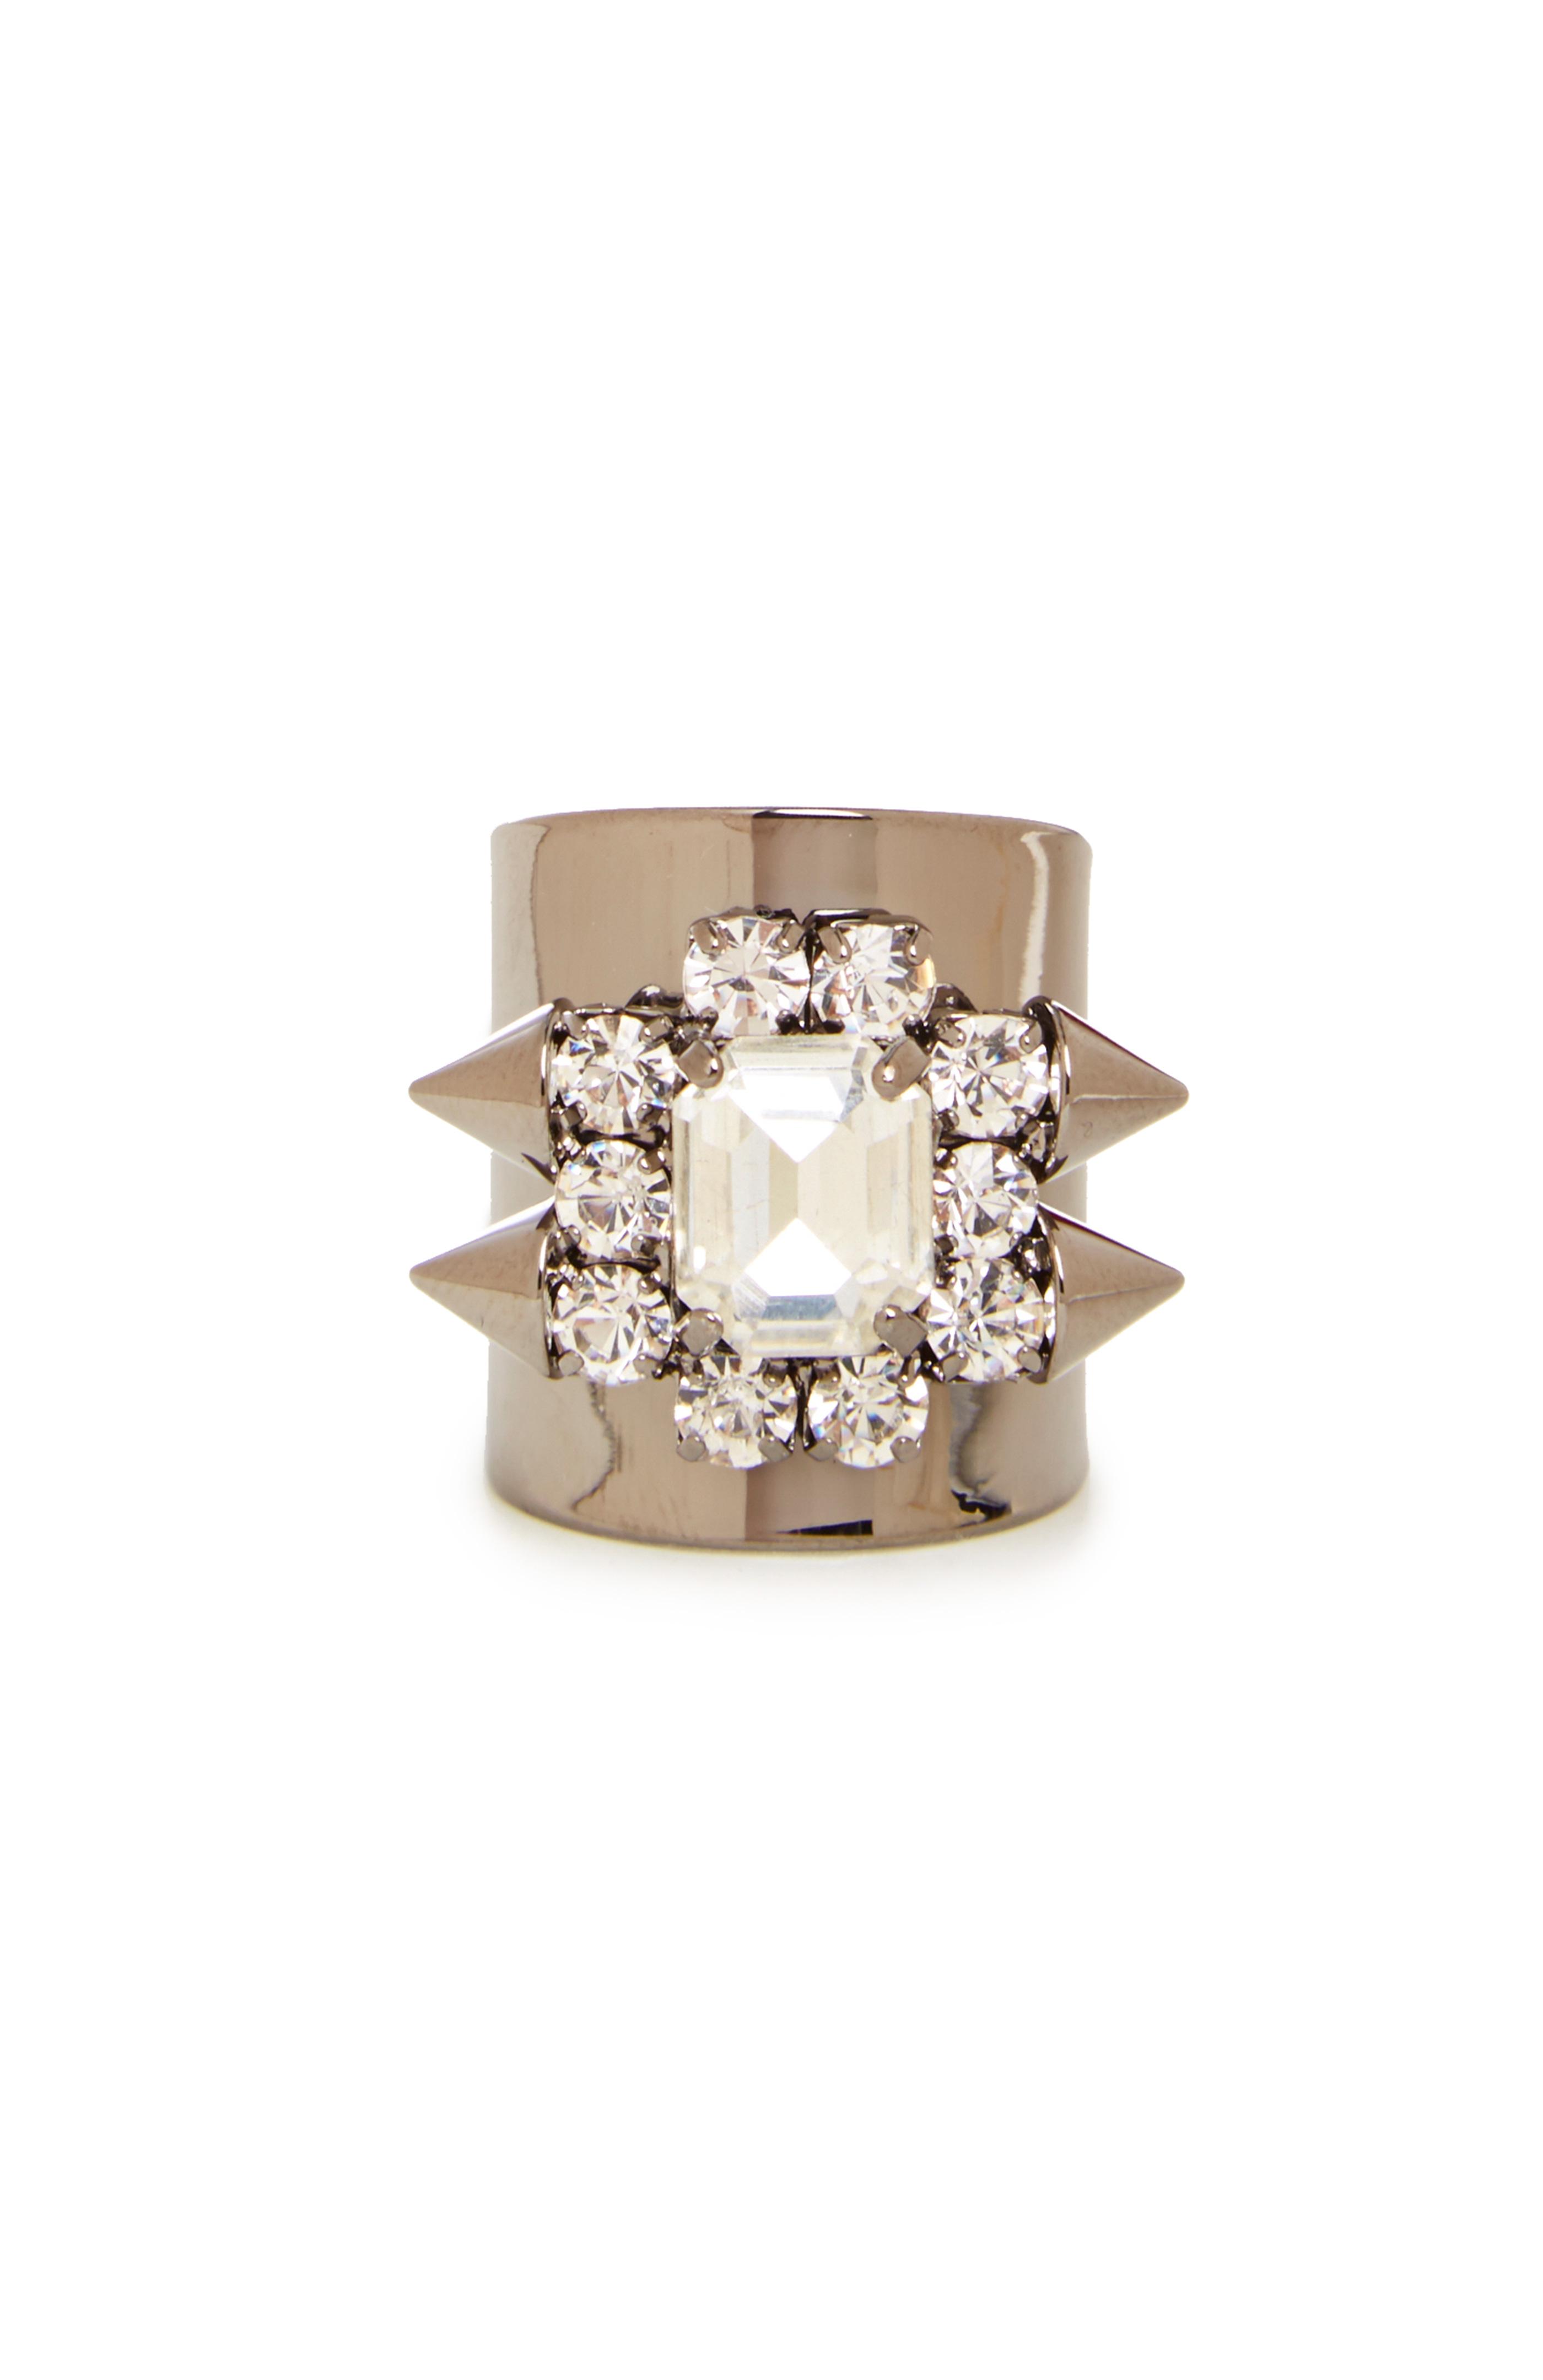 JOA Spiked Crystal Jewel Ring in gun metal at DAILYLOOK